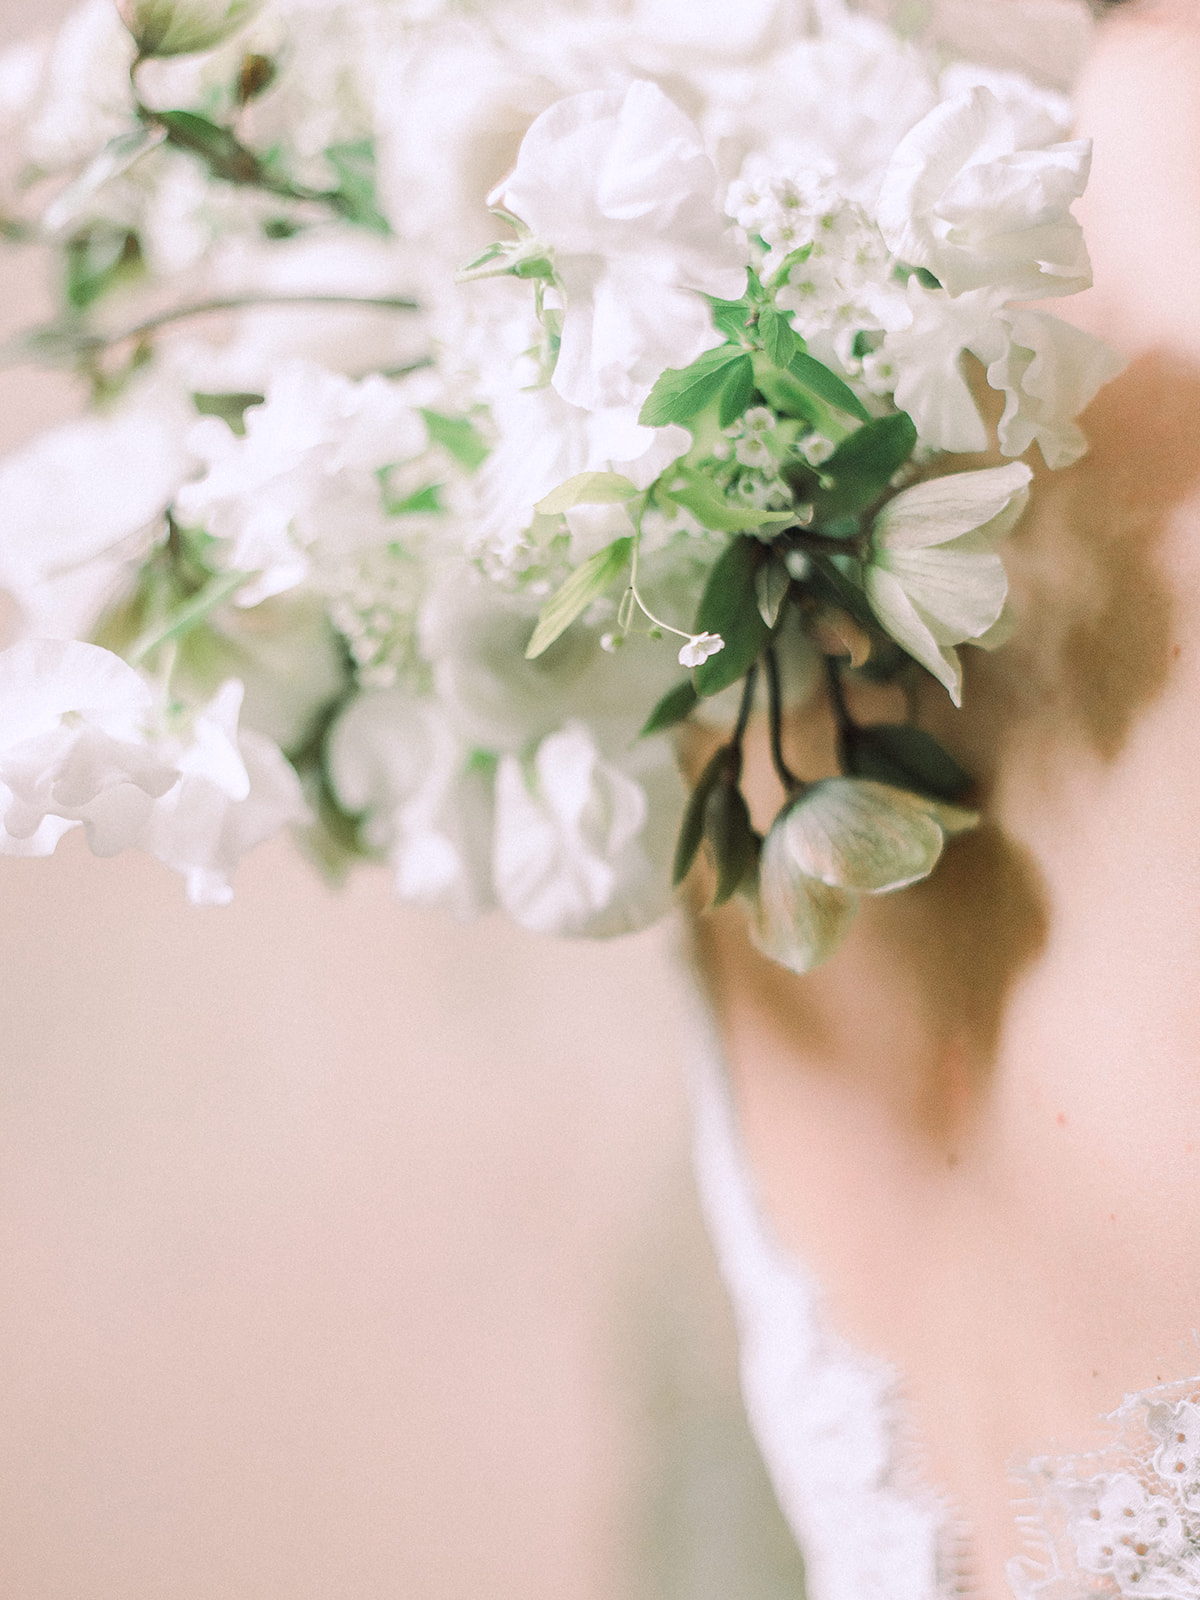 Green-Monsters-Bridal inspiration Floresie-174.jpg